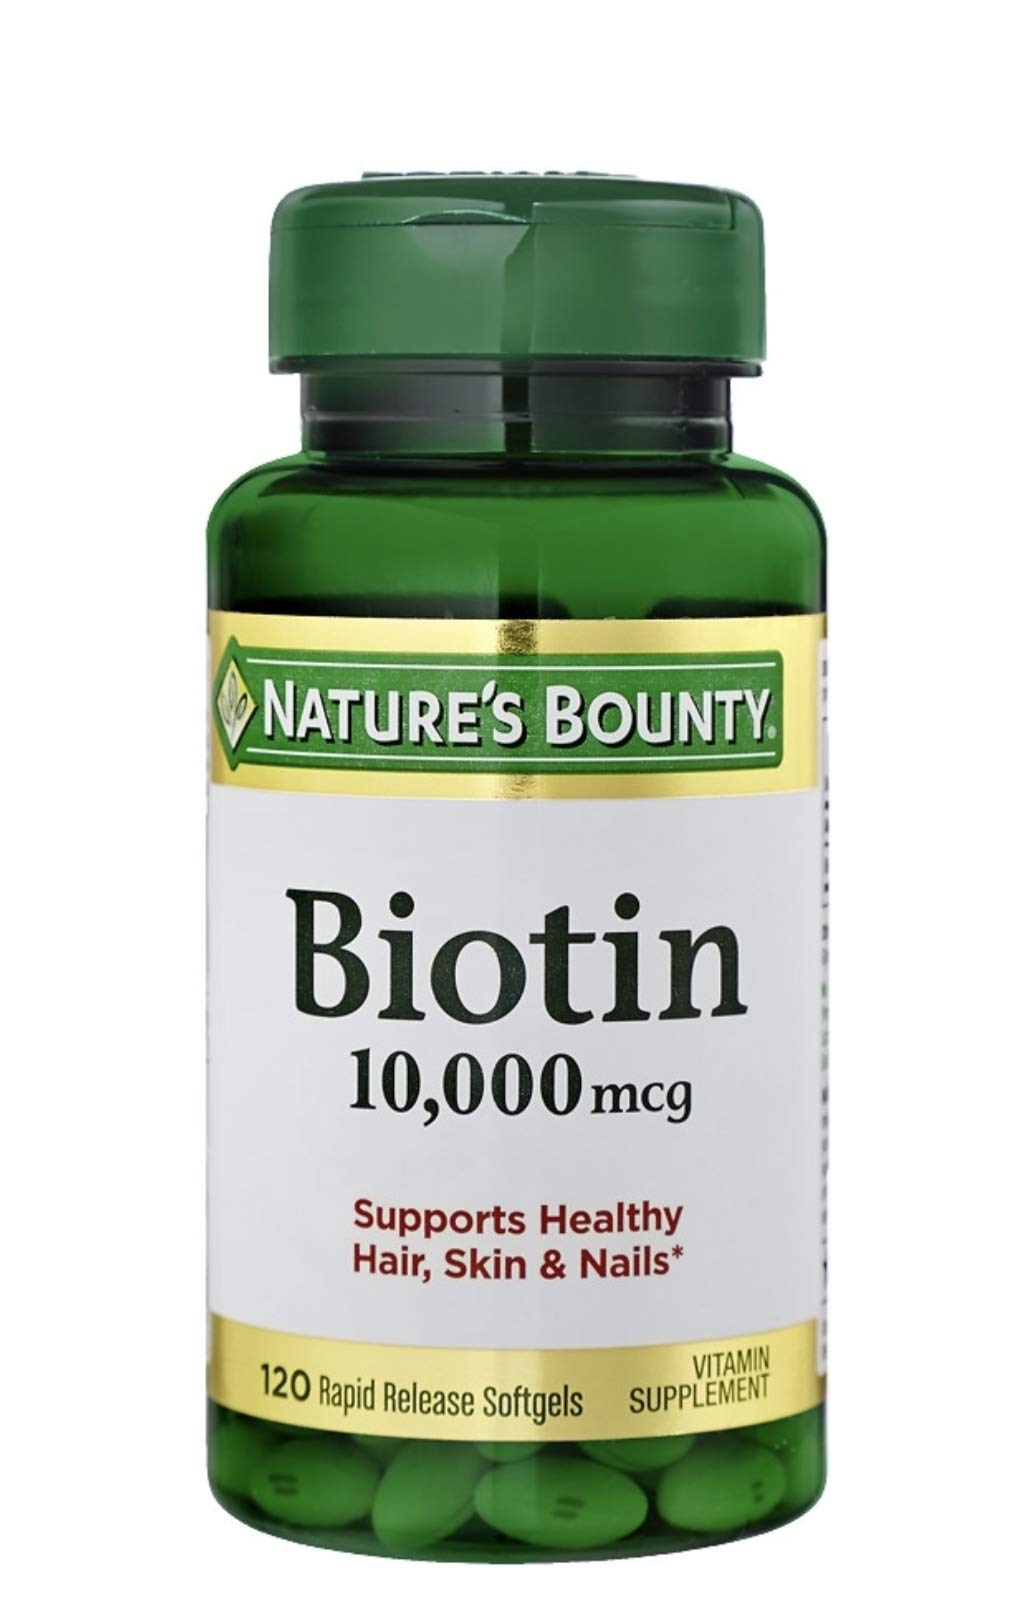 Nature's Bounty Biotin 10,000 MCG Softgels, Multi Pack of 360 Count Total